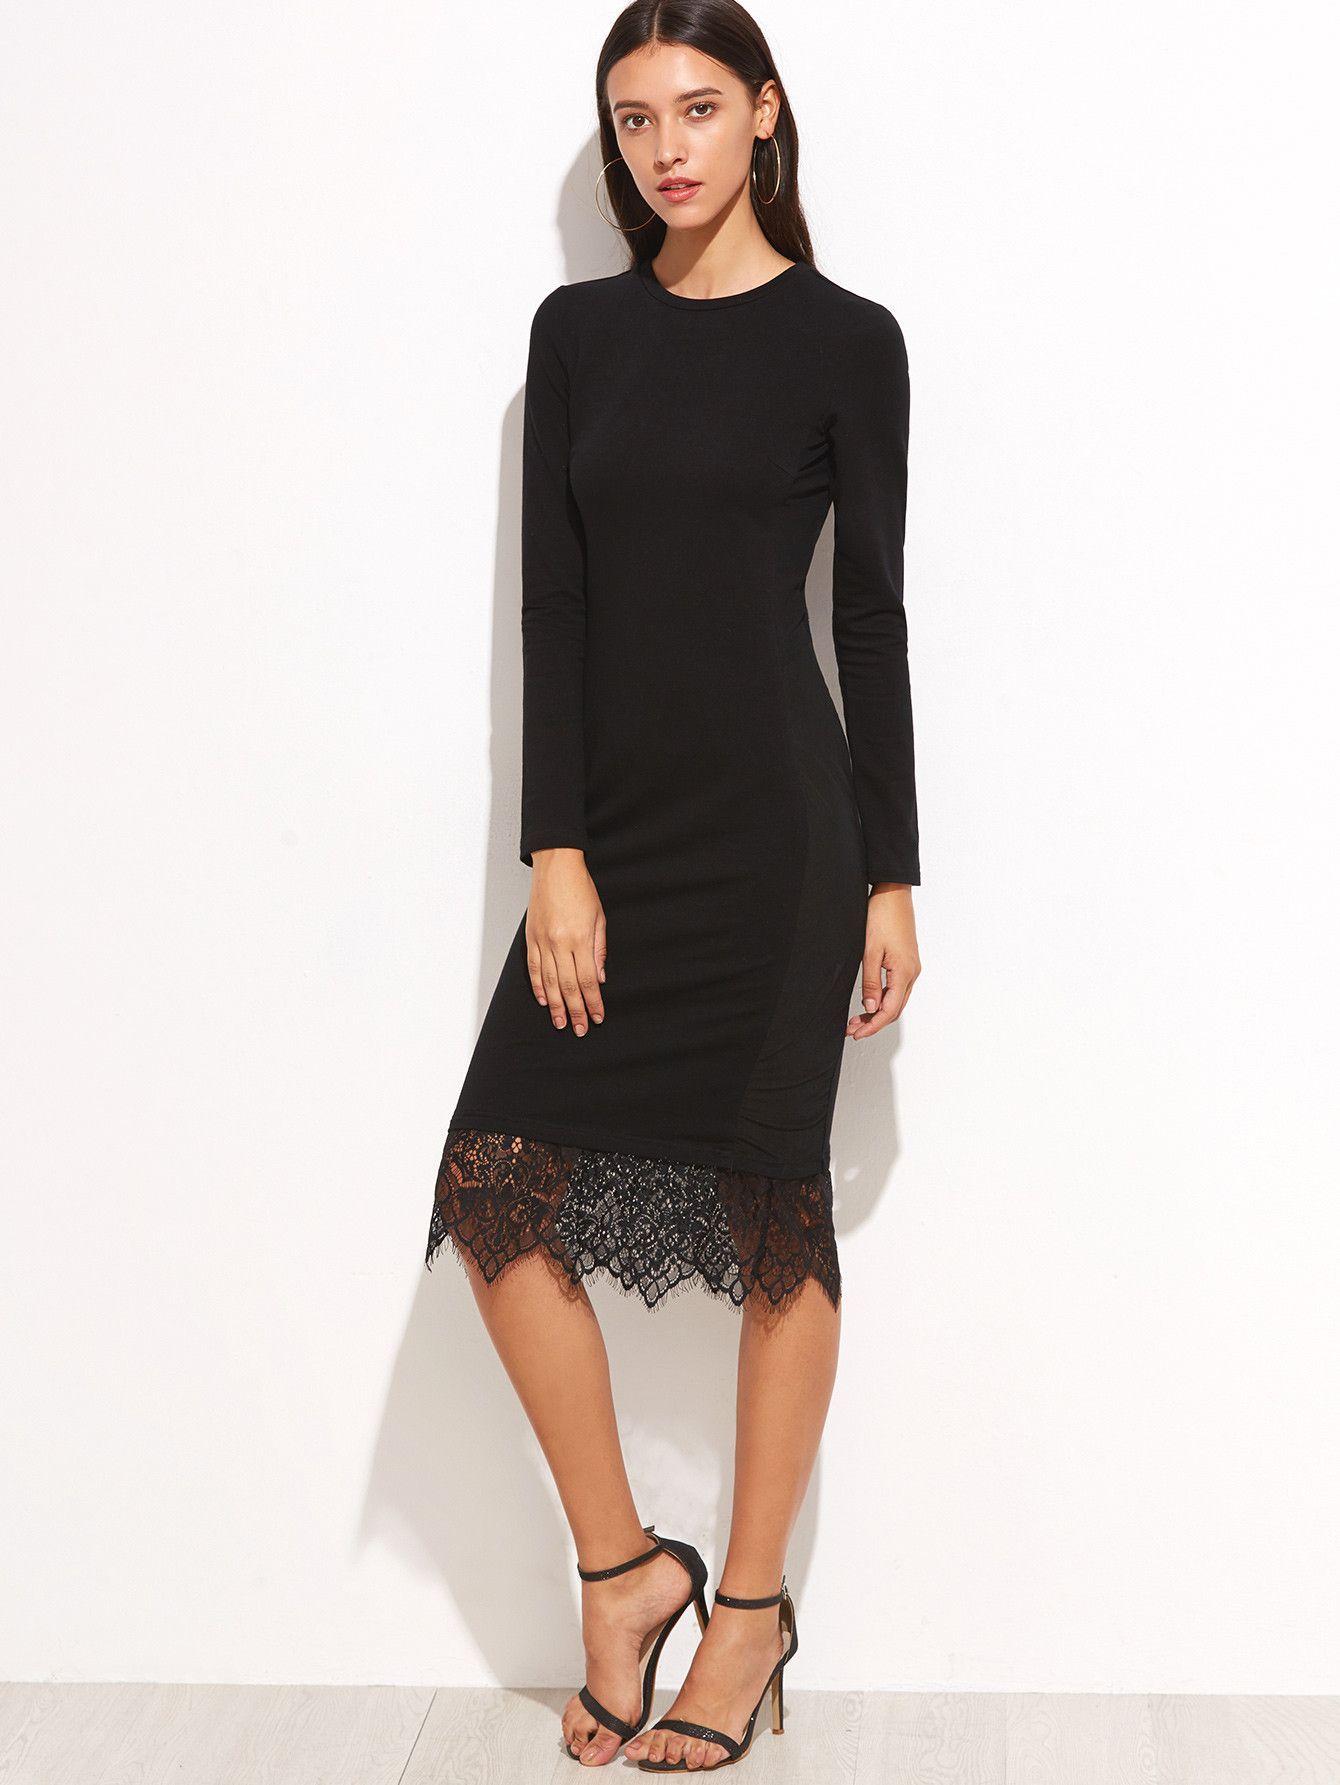 Black Lace Trim Long Sleeve Pencil Dress Long Sleeve Pencil Dress Pencil Dress Midi Pencil Dress [ 1785 x 1340 Pixel ]